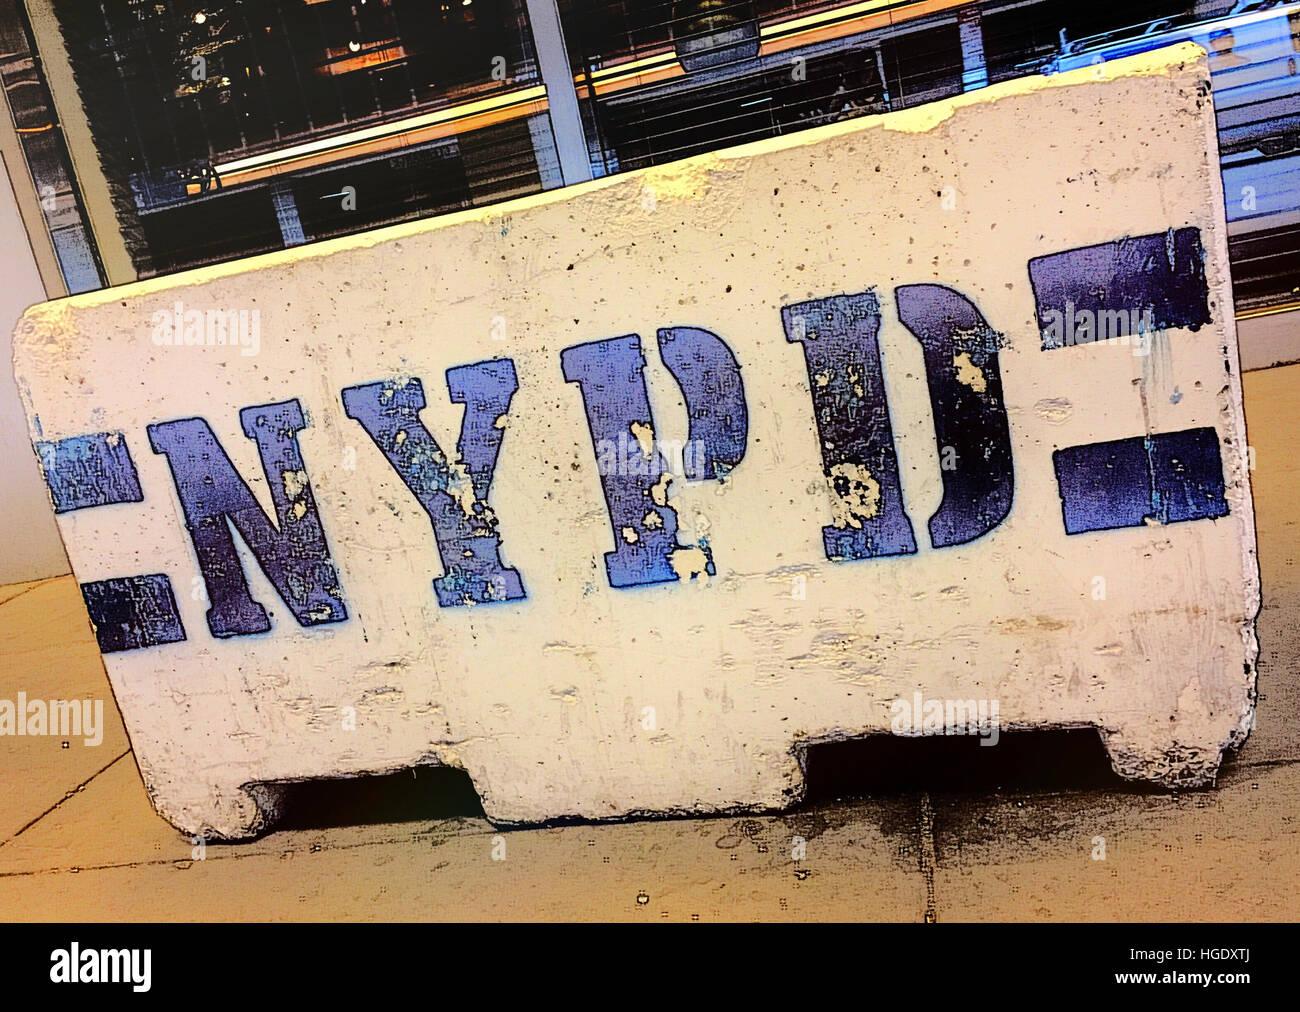 New York Police Department Barricade, NYC, USA - Stock Image